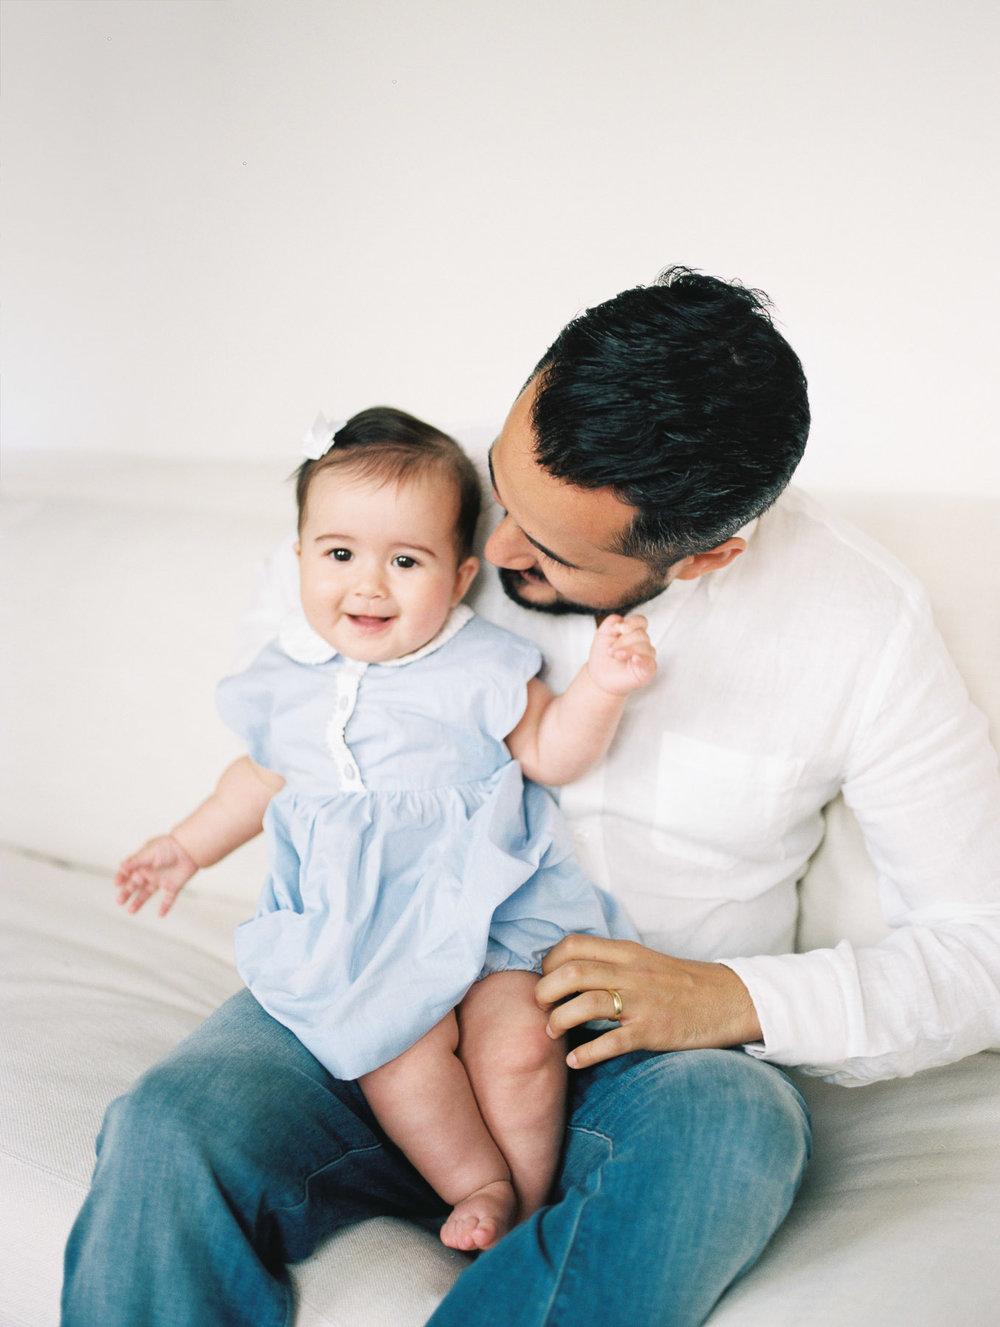 NY Newborn Photographer